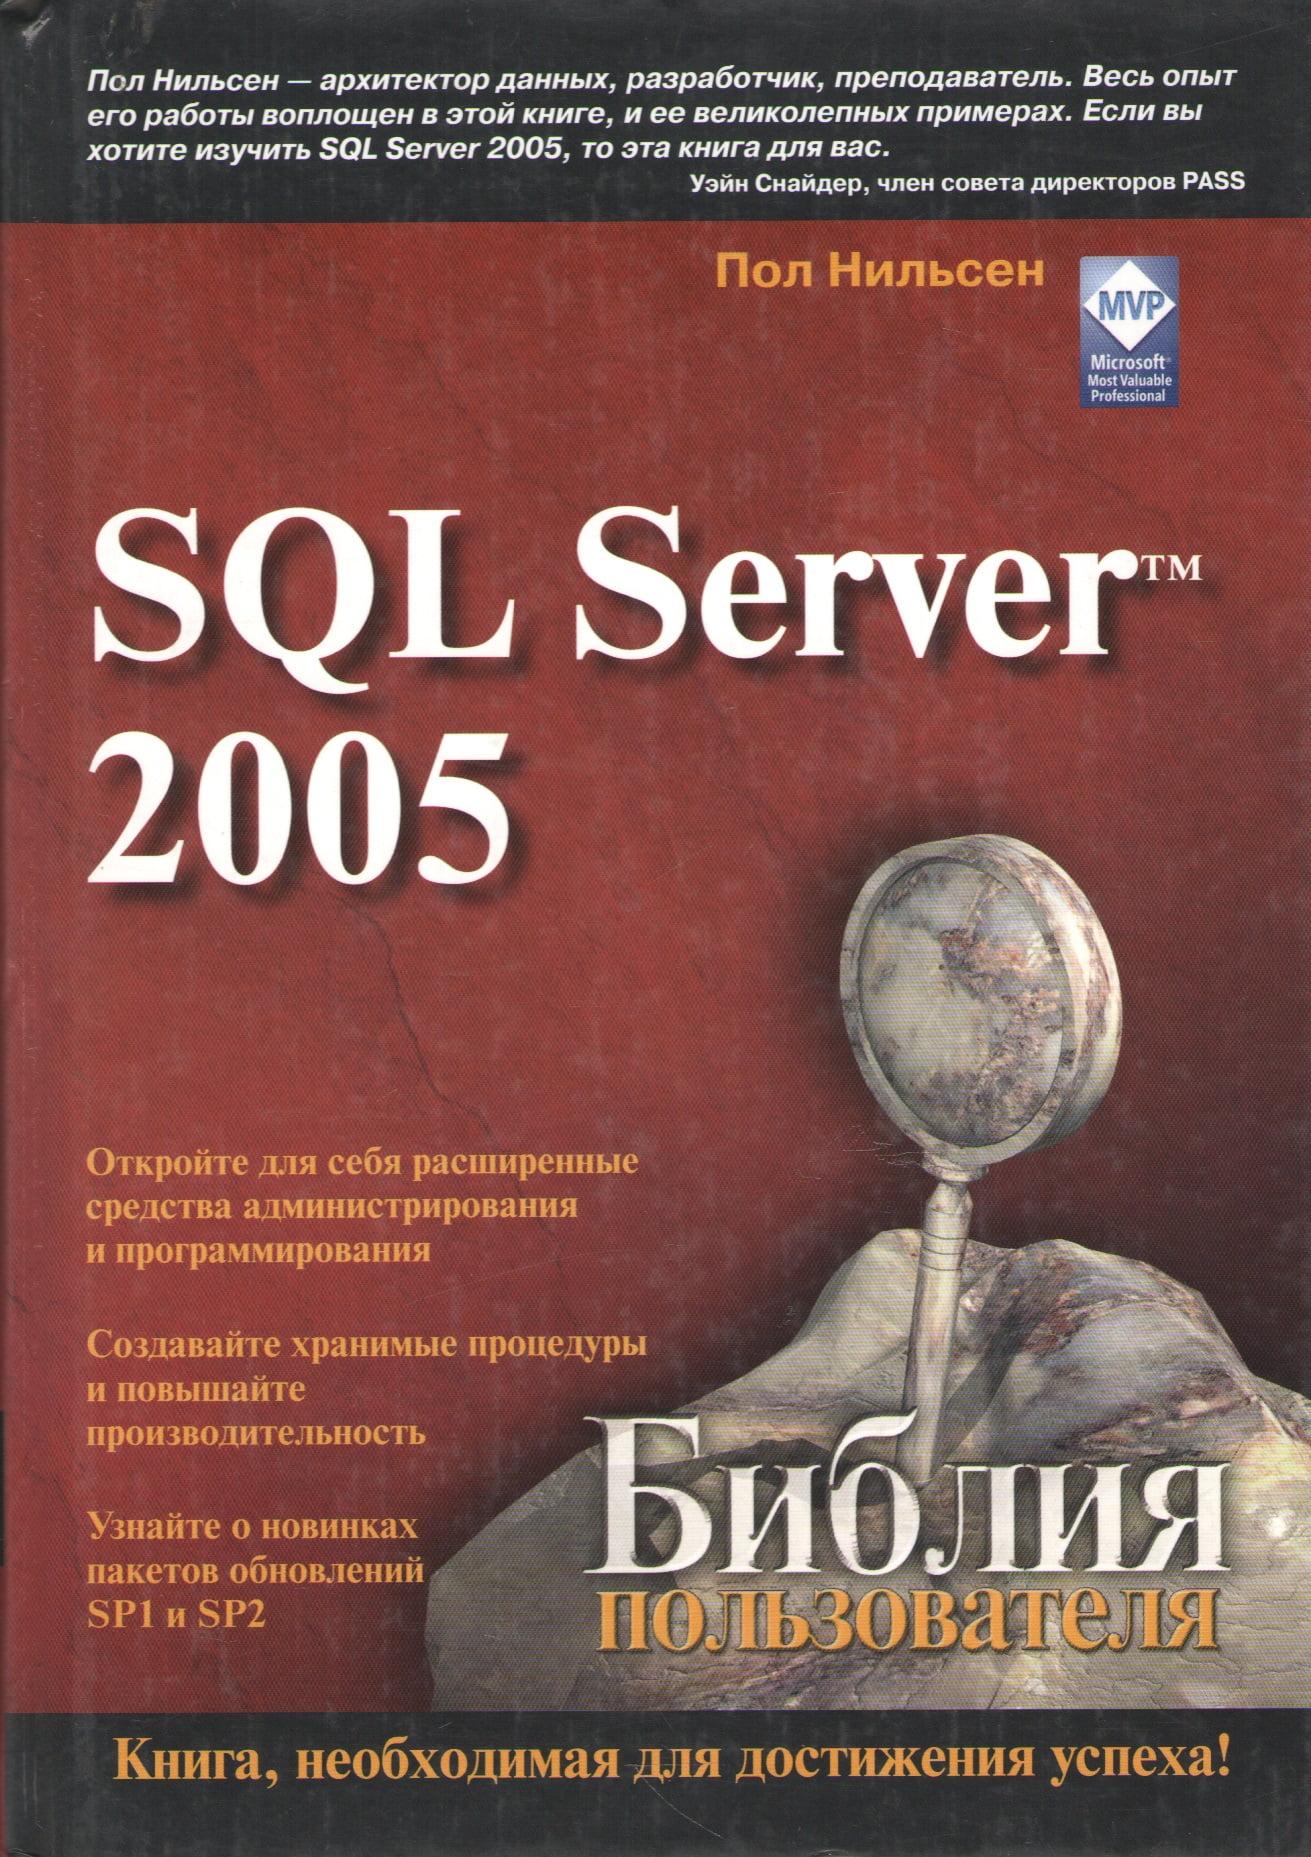 Microsoft+SQL+Server+2005.+%D0%91%D1%96%D0%B1%D0%BB%D1%96%D1%8F+%D0%BA%D0%BE%D1%80%D0%B8%D1%81%D1%82%D1%83%D0%B2%D0%B0%D1%87%D0%B0 - фото 1